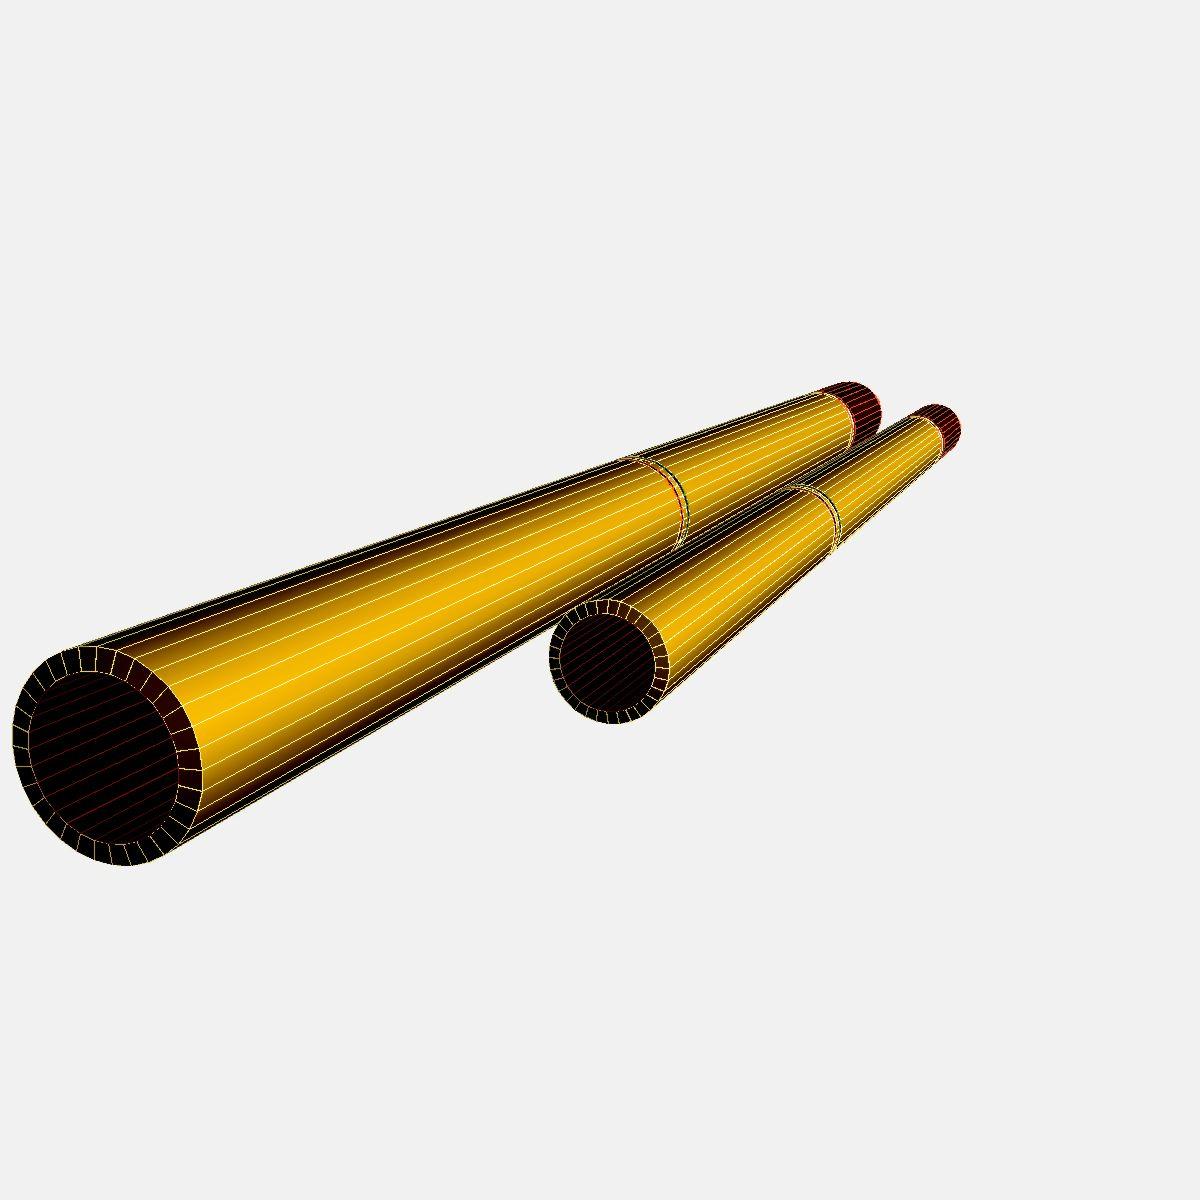 fadjr-3 & fadjr-5 rocket 3d model 3ds dxf fbx blend cob dae x  obj 205486